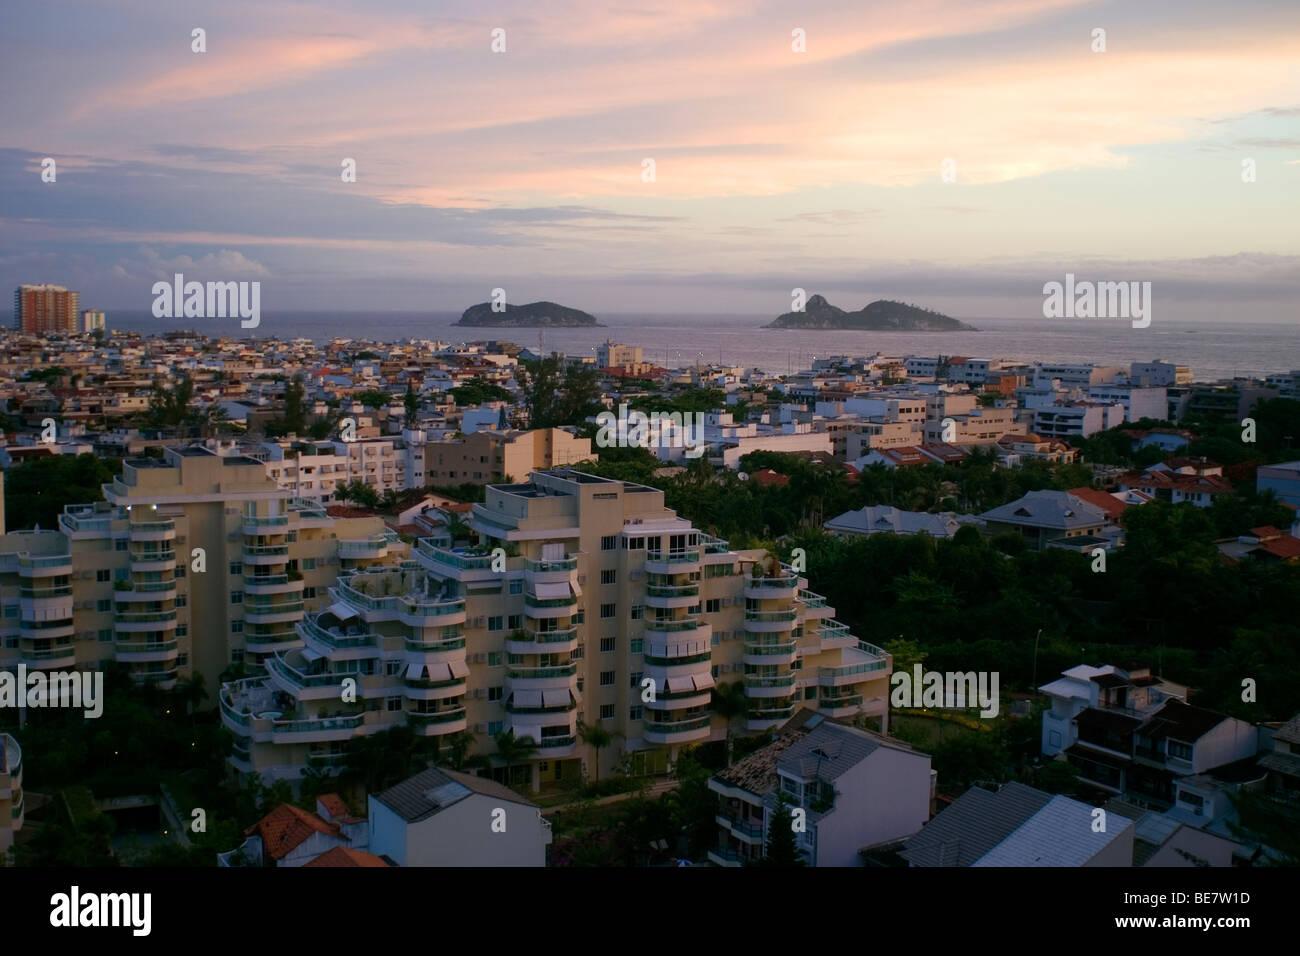 Aerial view of Barra da Tijuca, a classy neighborhood in Rio de Janeiro, Brazil - Stock Image